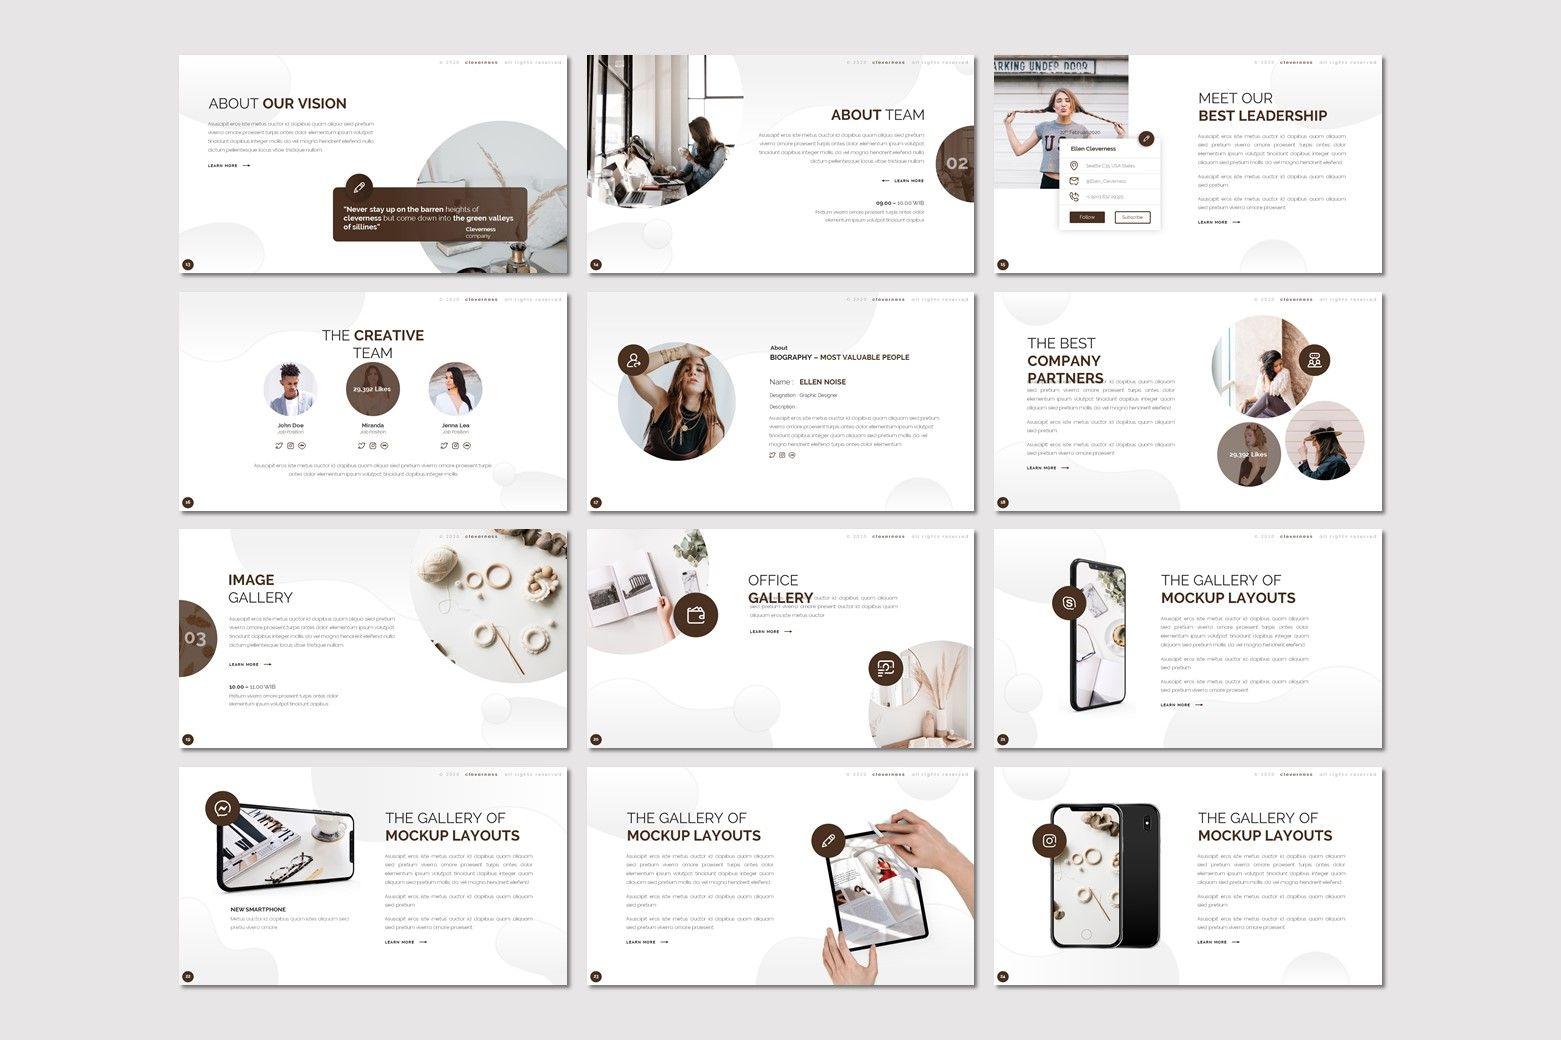 Clevernes - Google Slides Template, Slide 3, 07784, Presentation Templates — PoweredTemplate.com